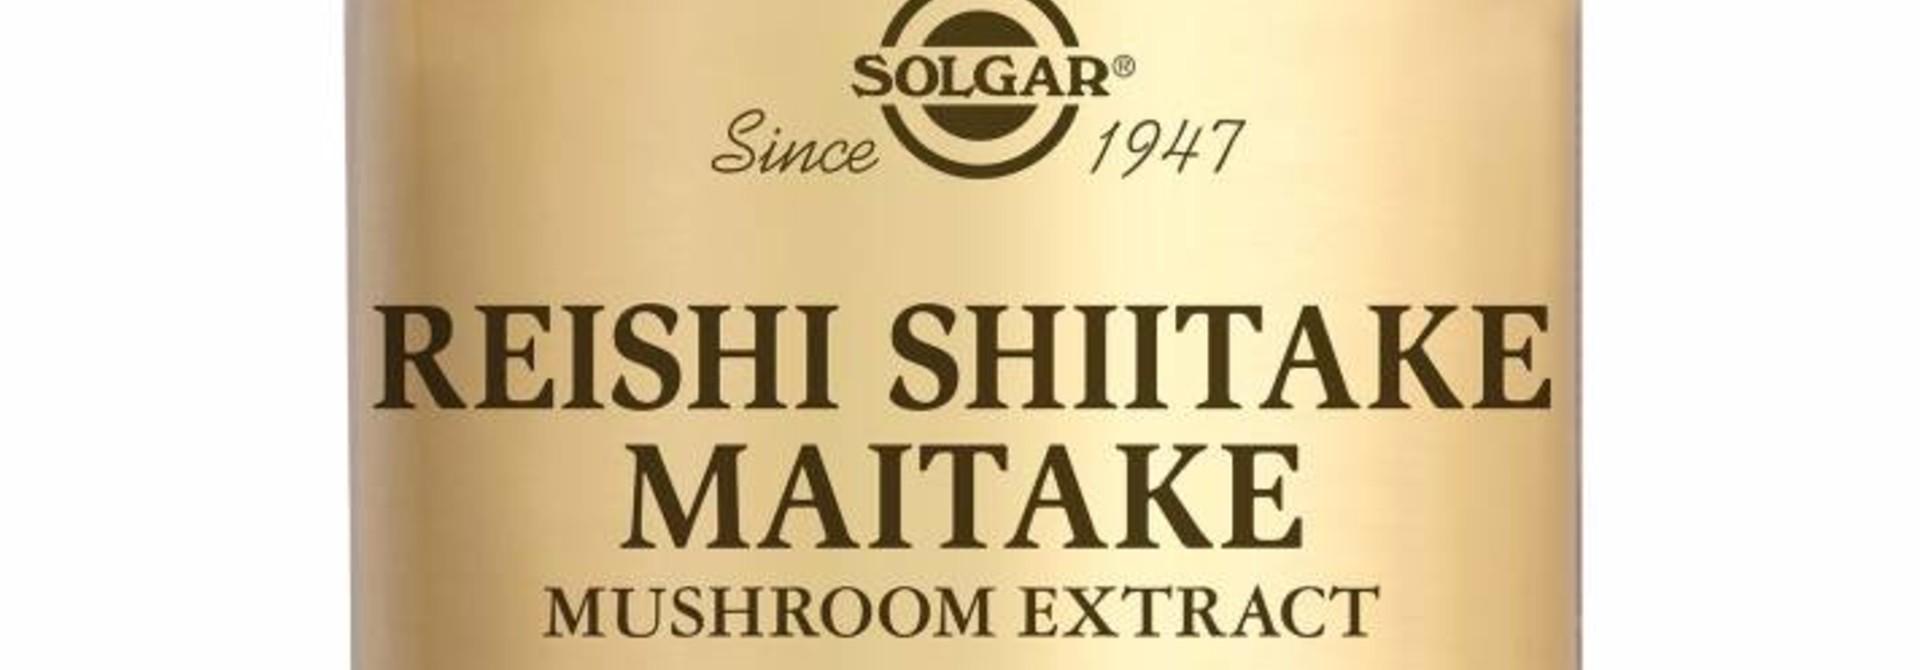 Reishi Shiitake Maitake Mushroom Extract 50 plantaardige capsules